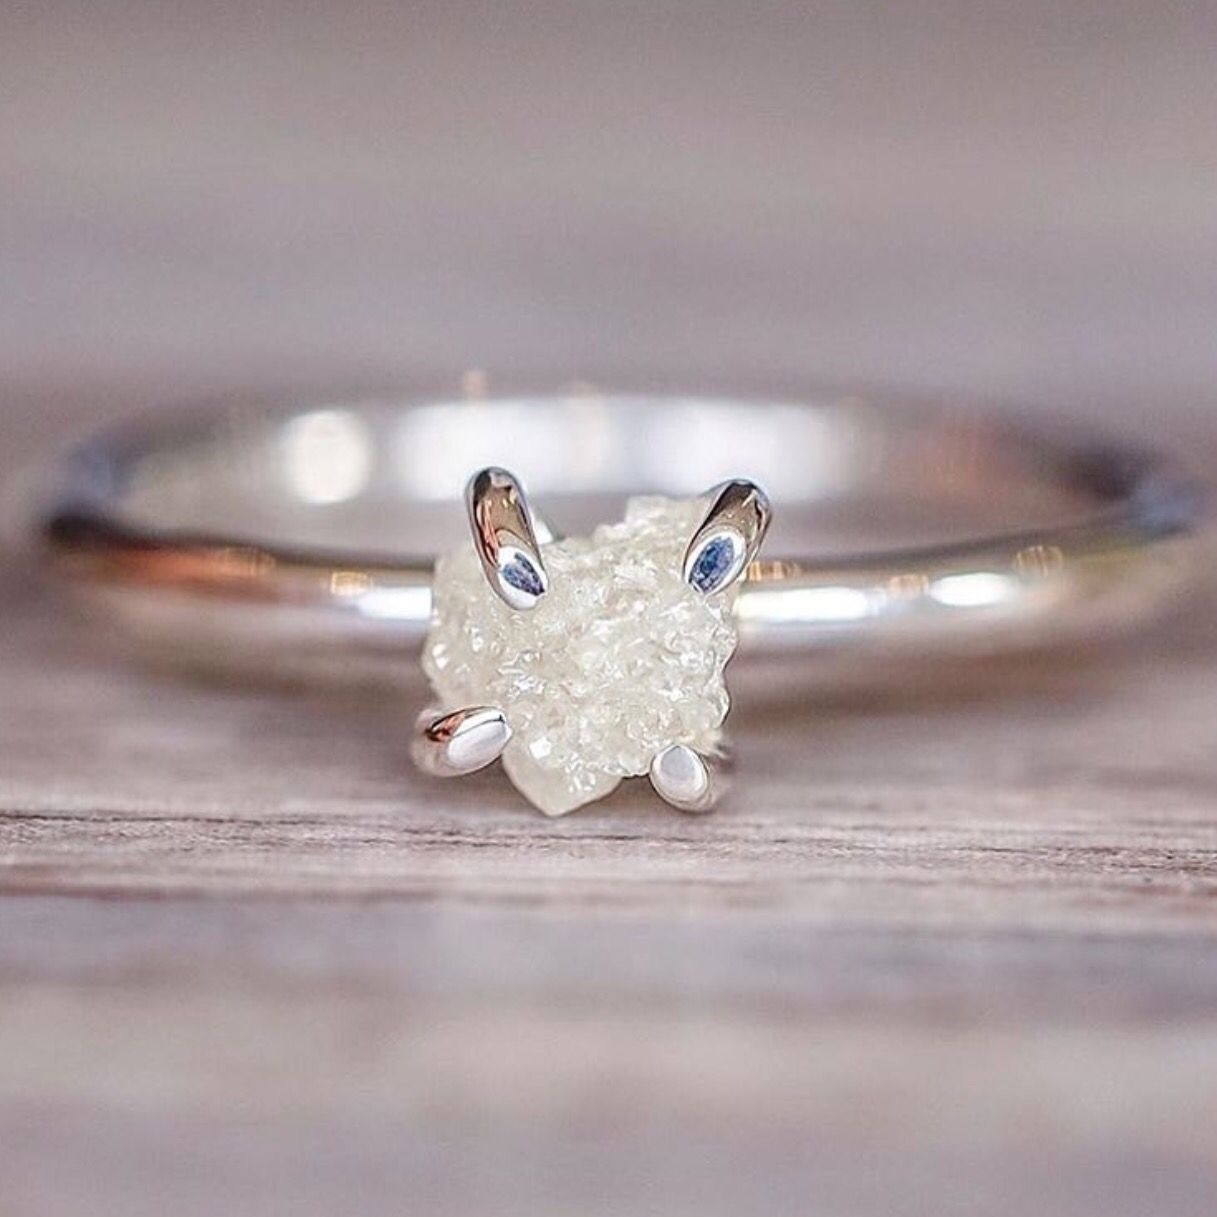 Dainty Boho Style Jewelry Size 6 Raw Herkimer Diamond Eternity Ring Sterling Silver